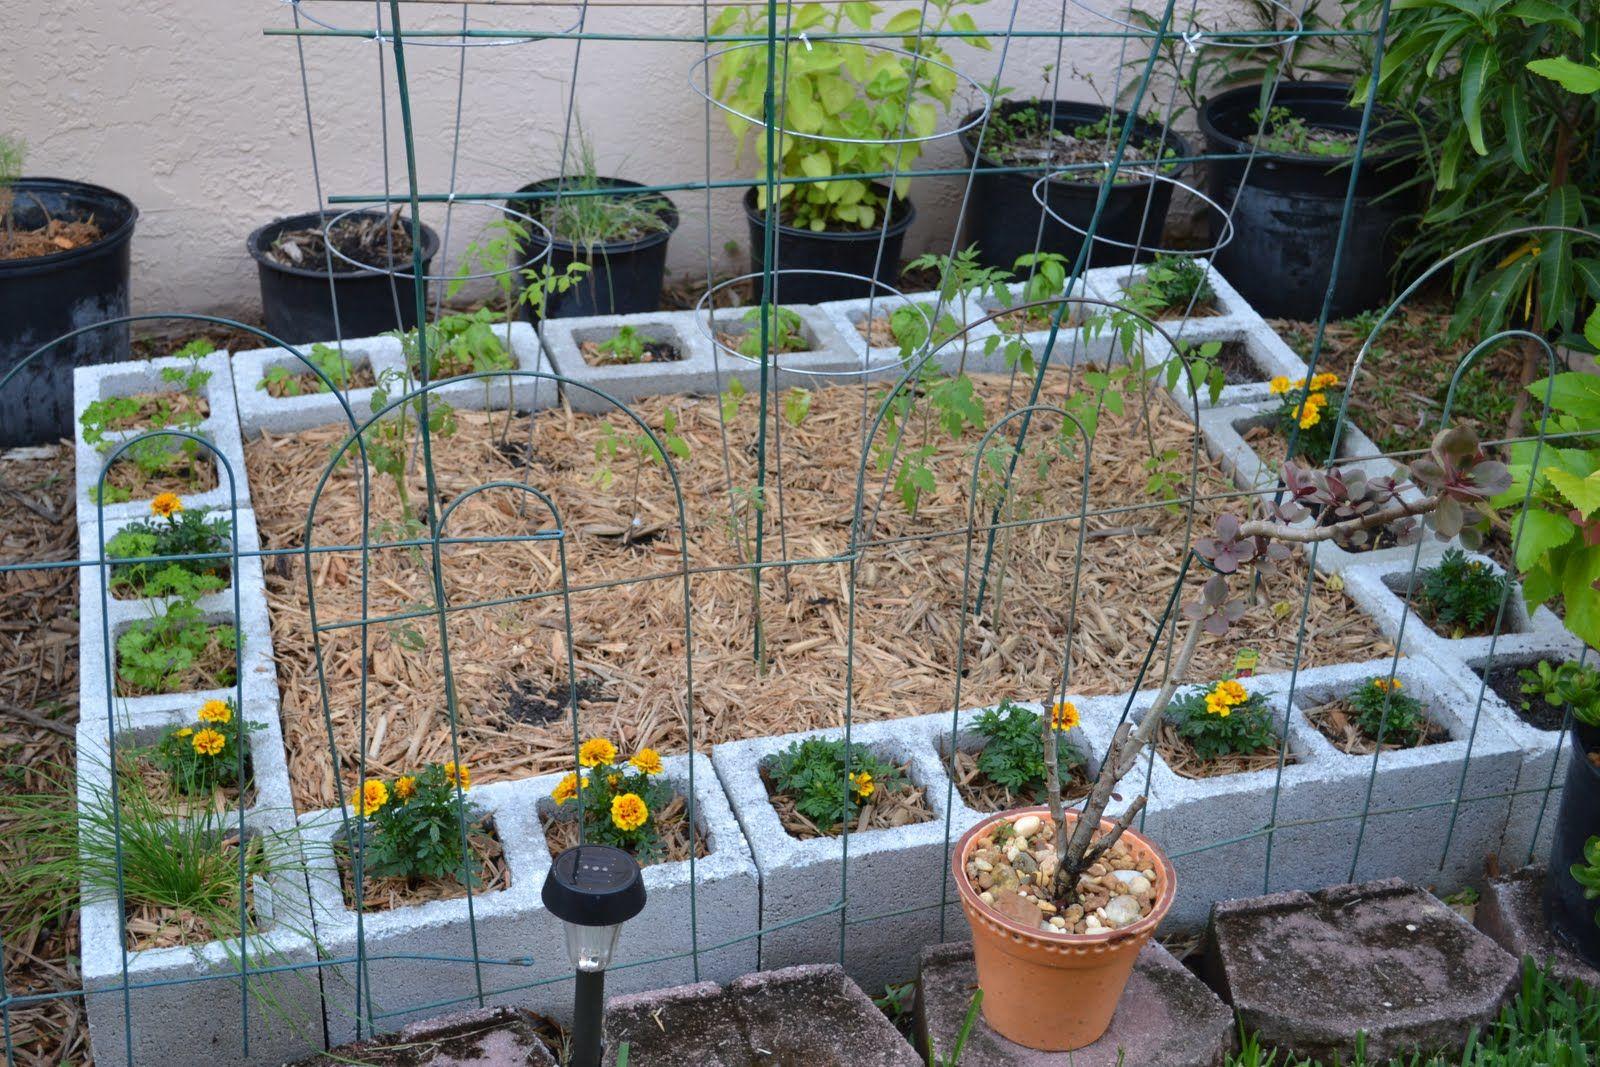 Diy Cinder Block Raised Garden Bed Spray Paint The Cinder Block For More Color Garden